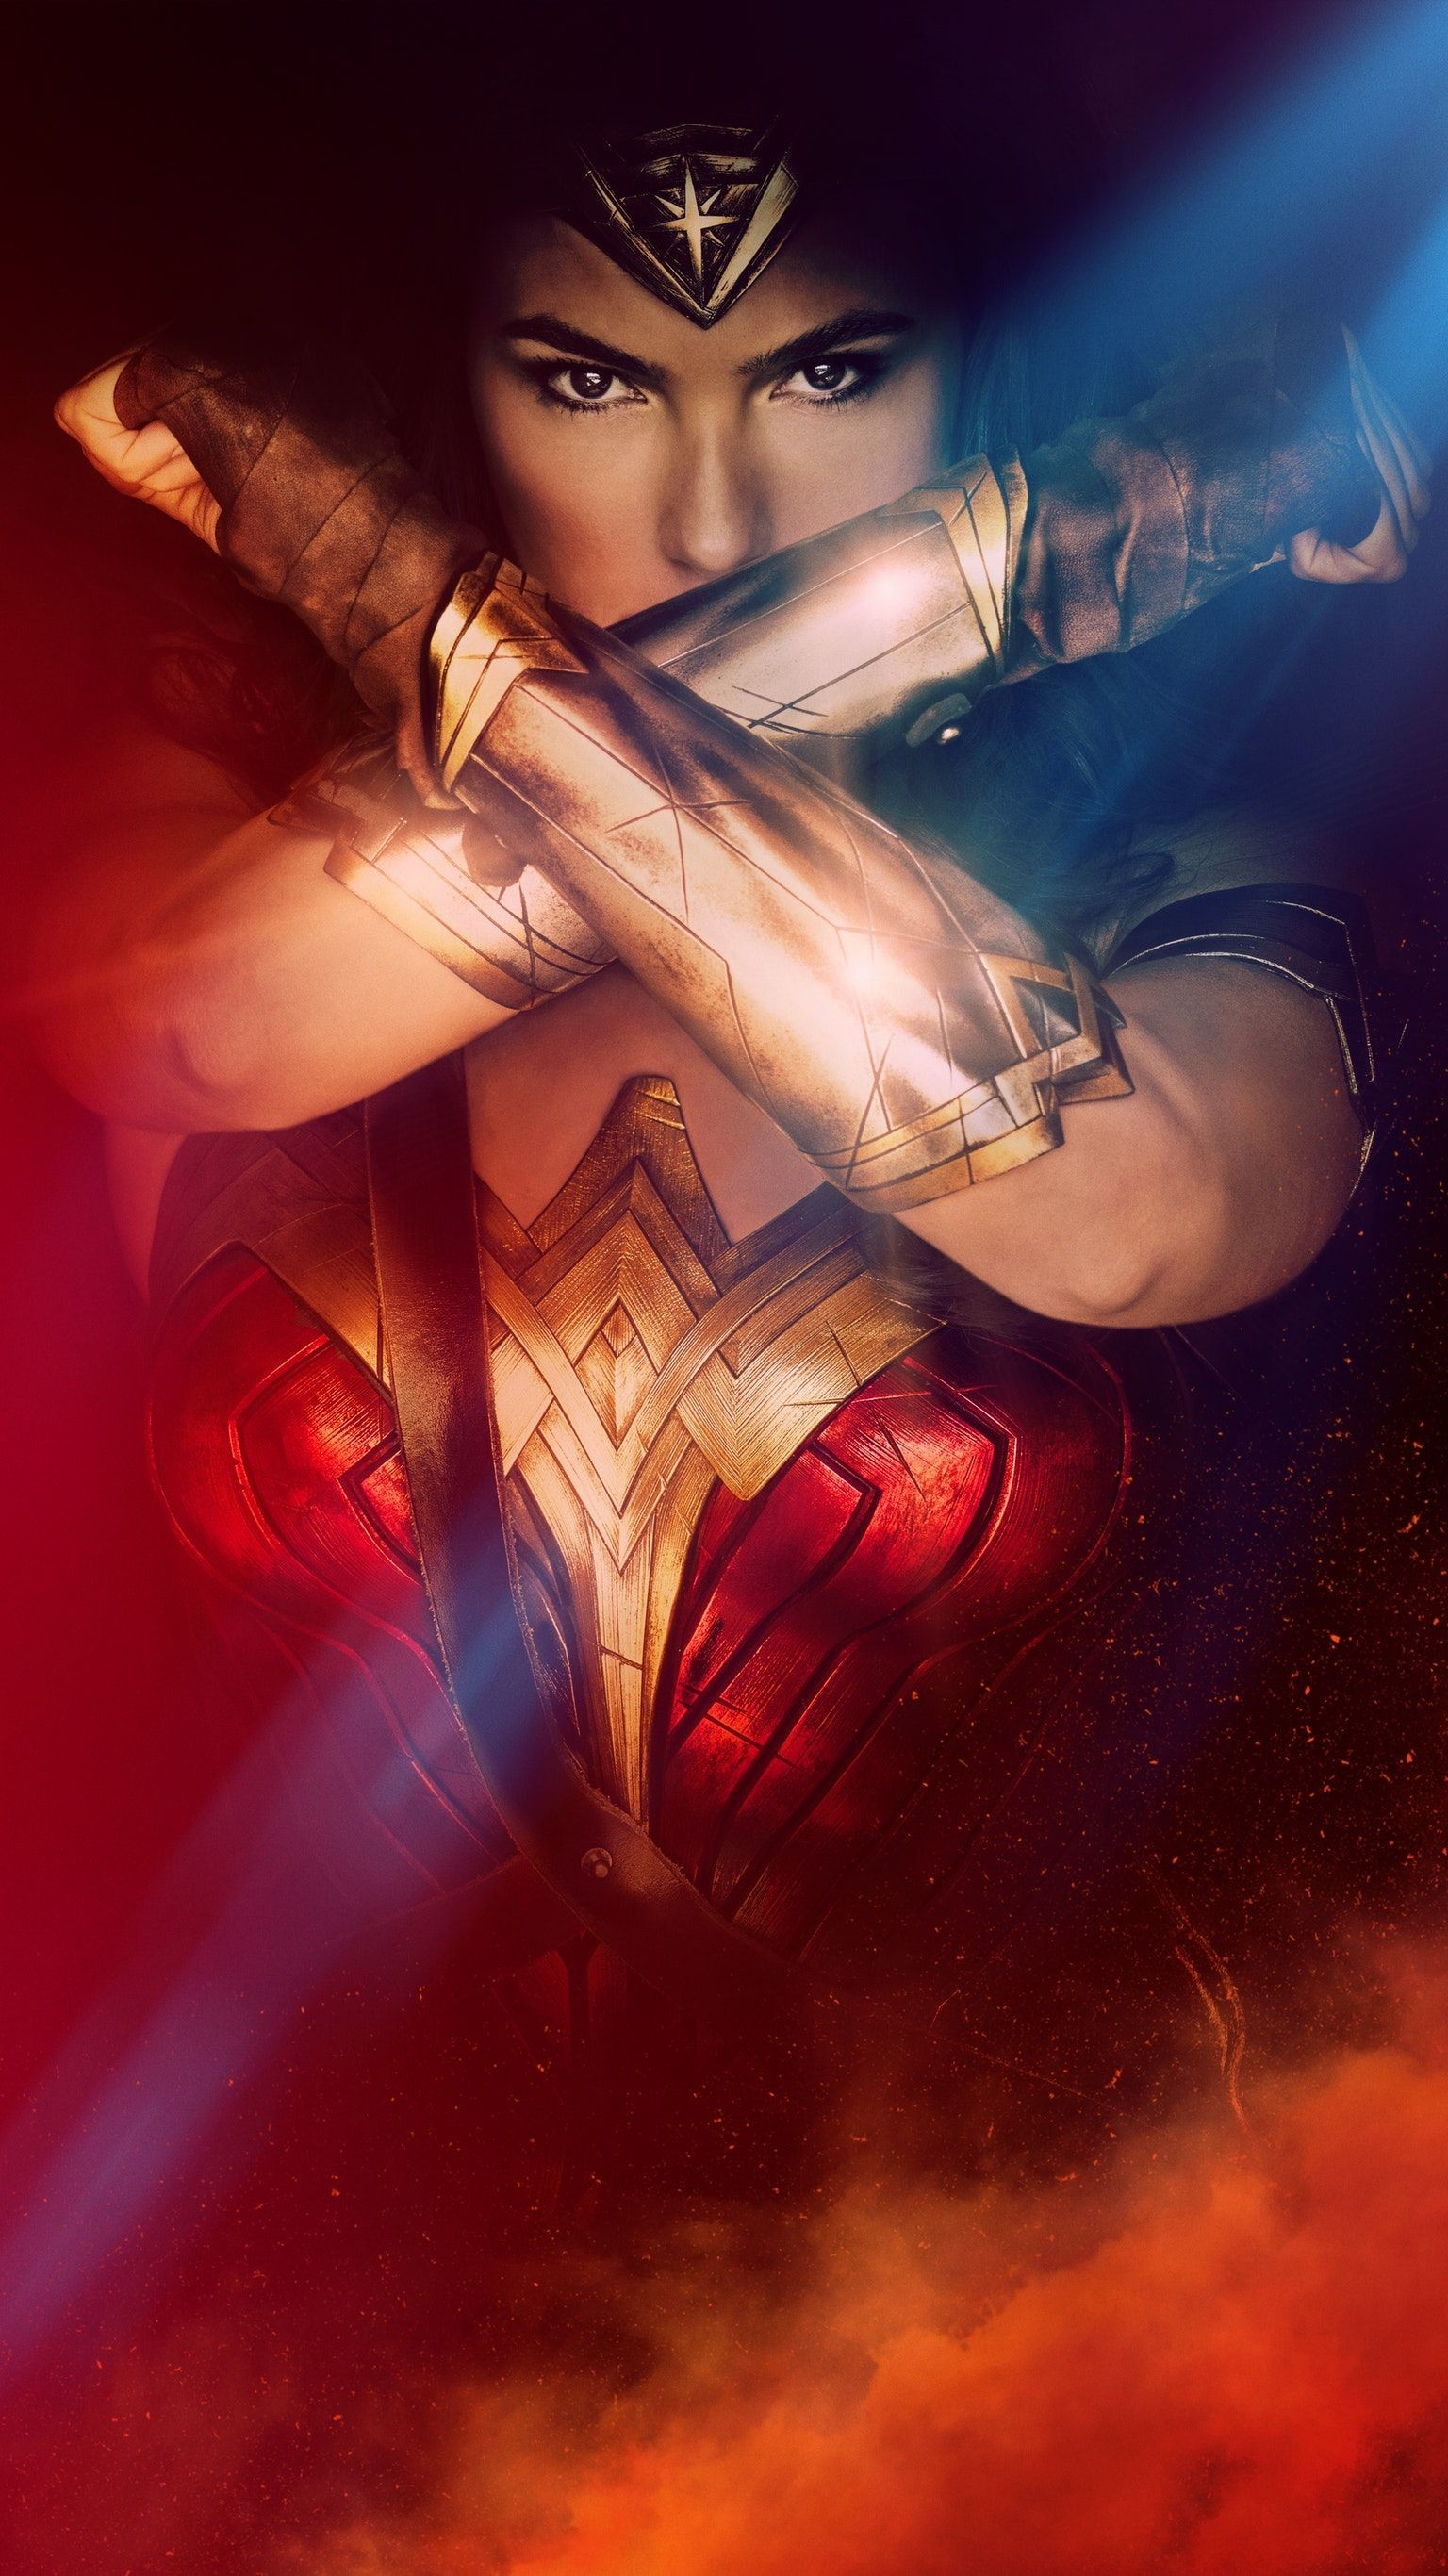 Wonder Woman Wallpaper Images 77 Images